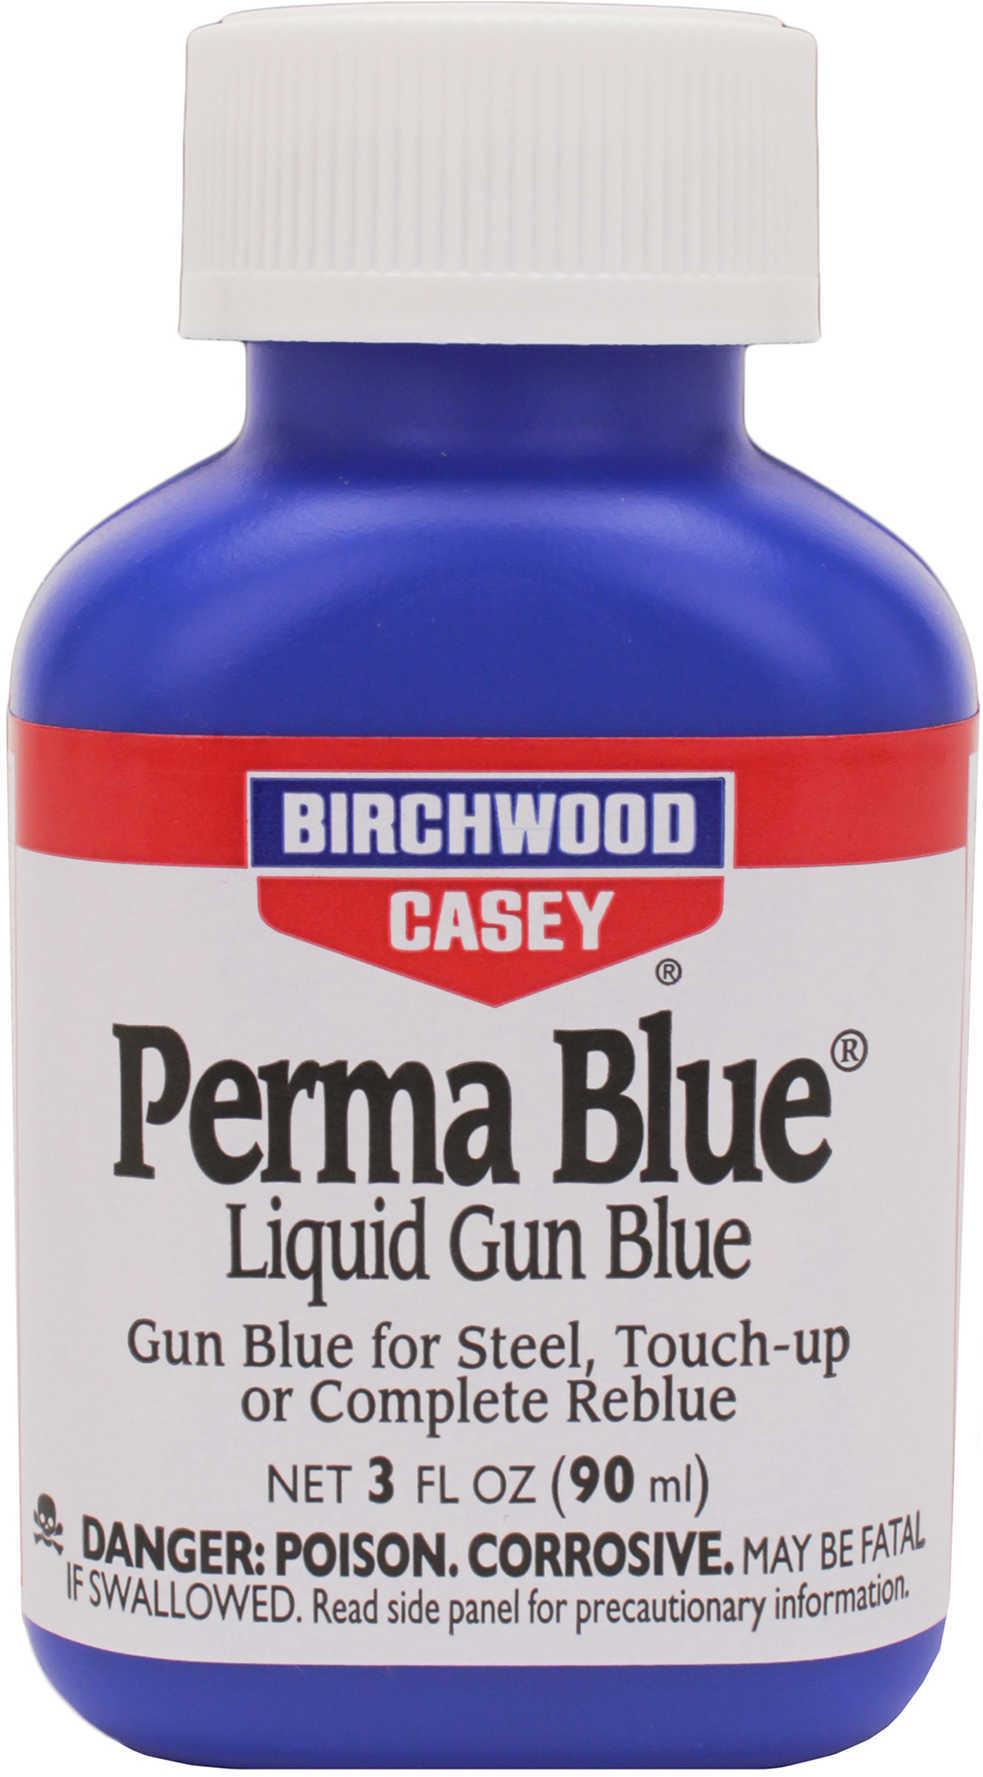 Birchwood Casey Perma Blue Liquid Gun Blue 3Oz Bottle